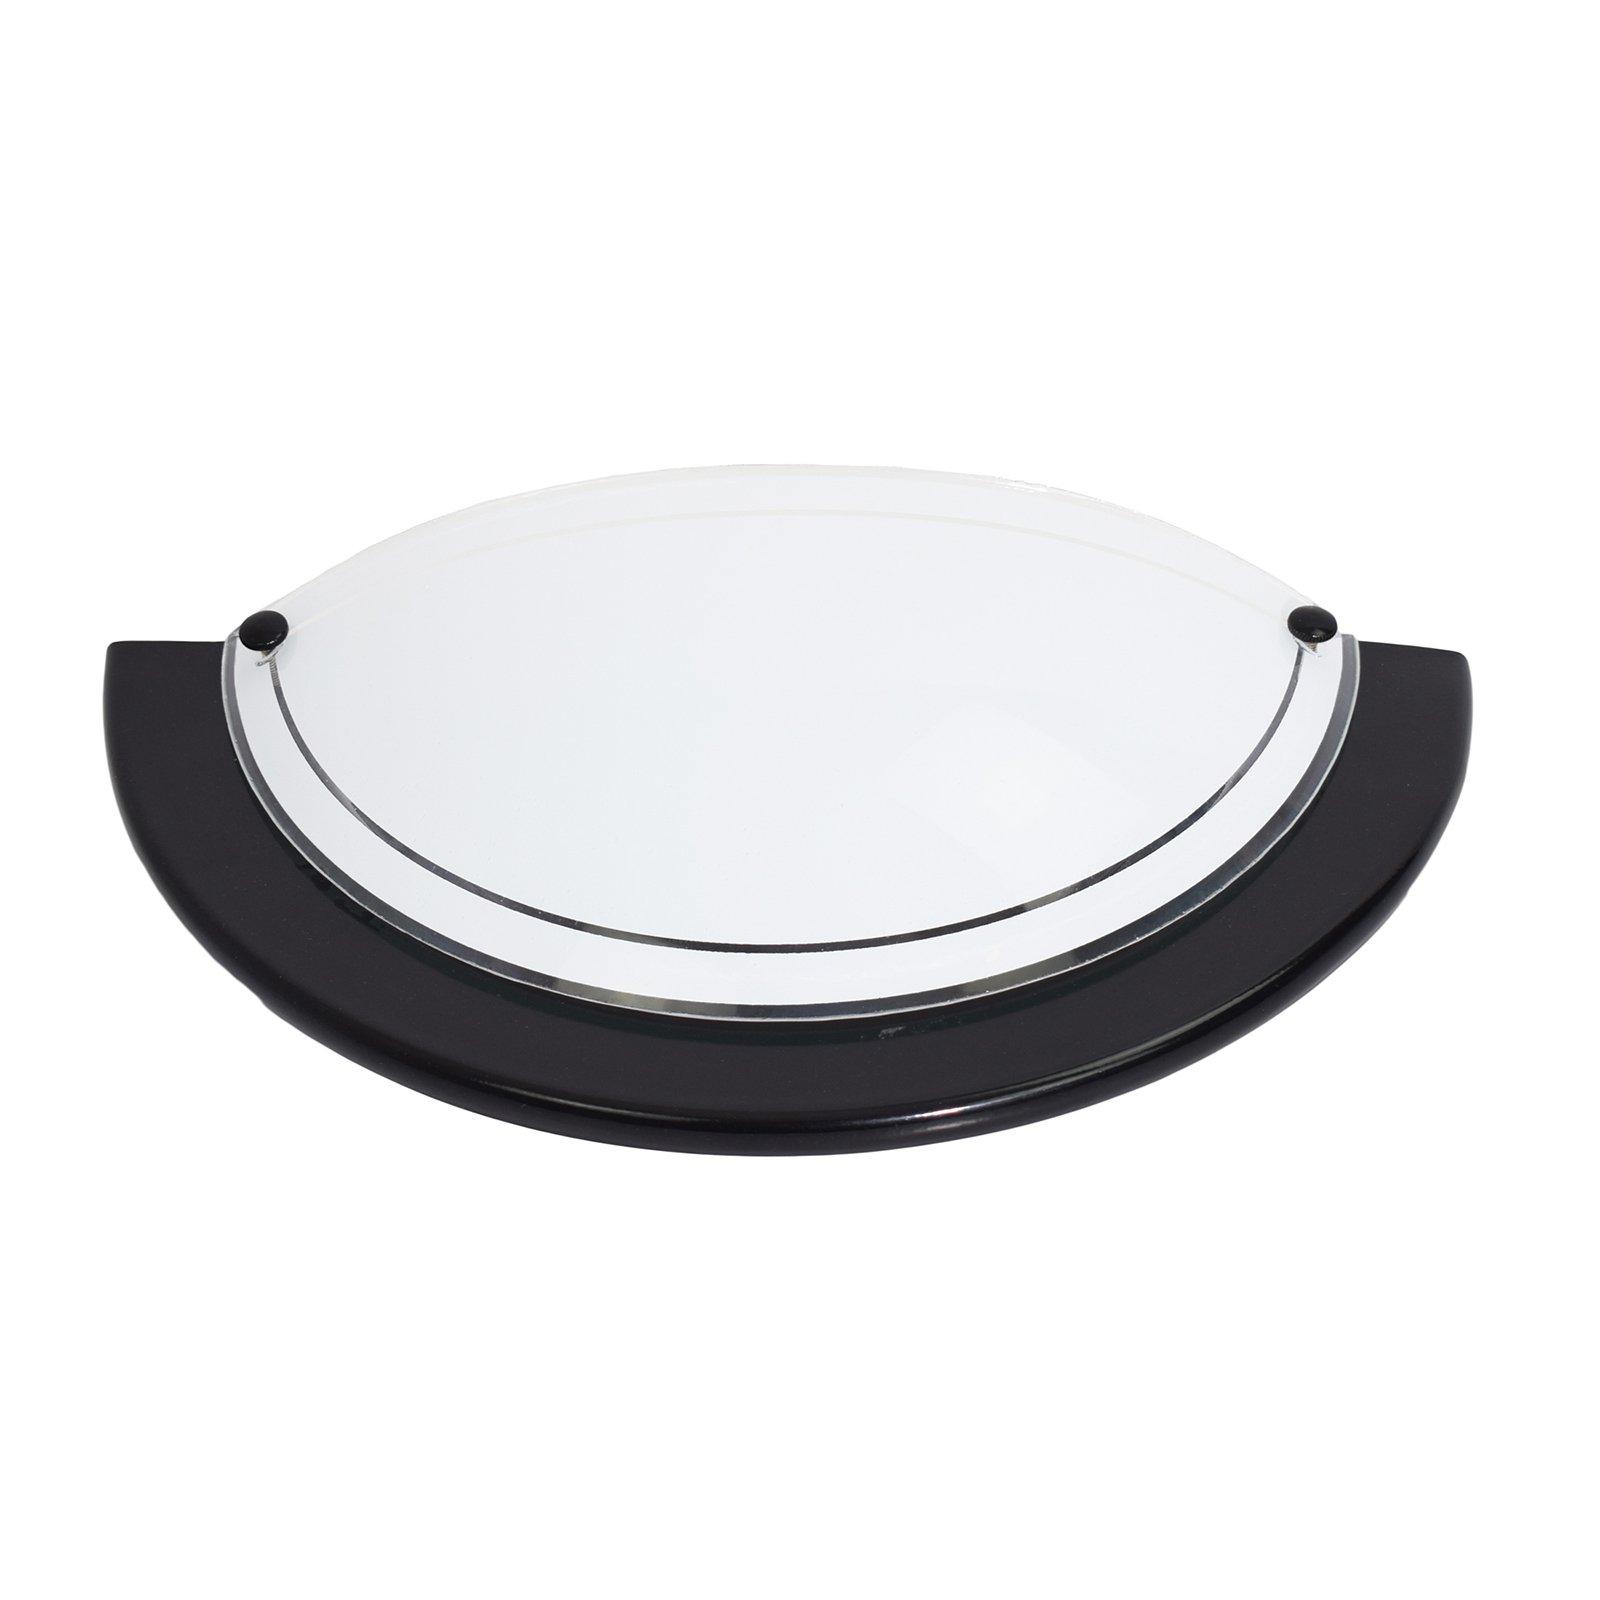 Vegglampe K1B, svart